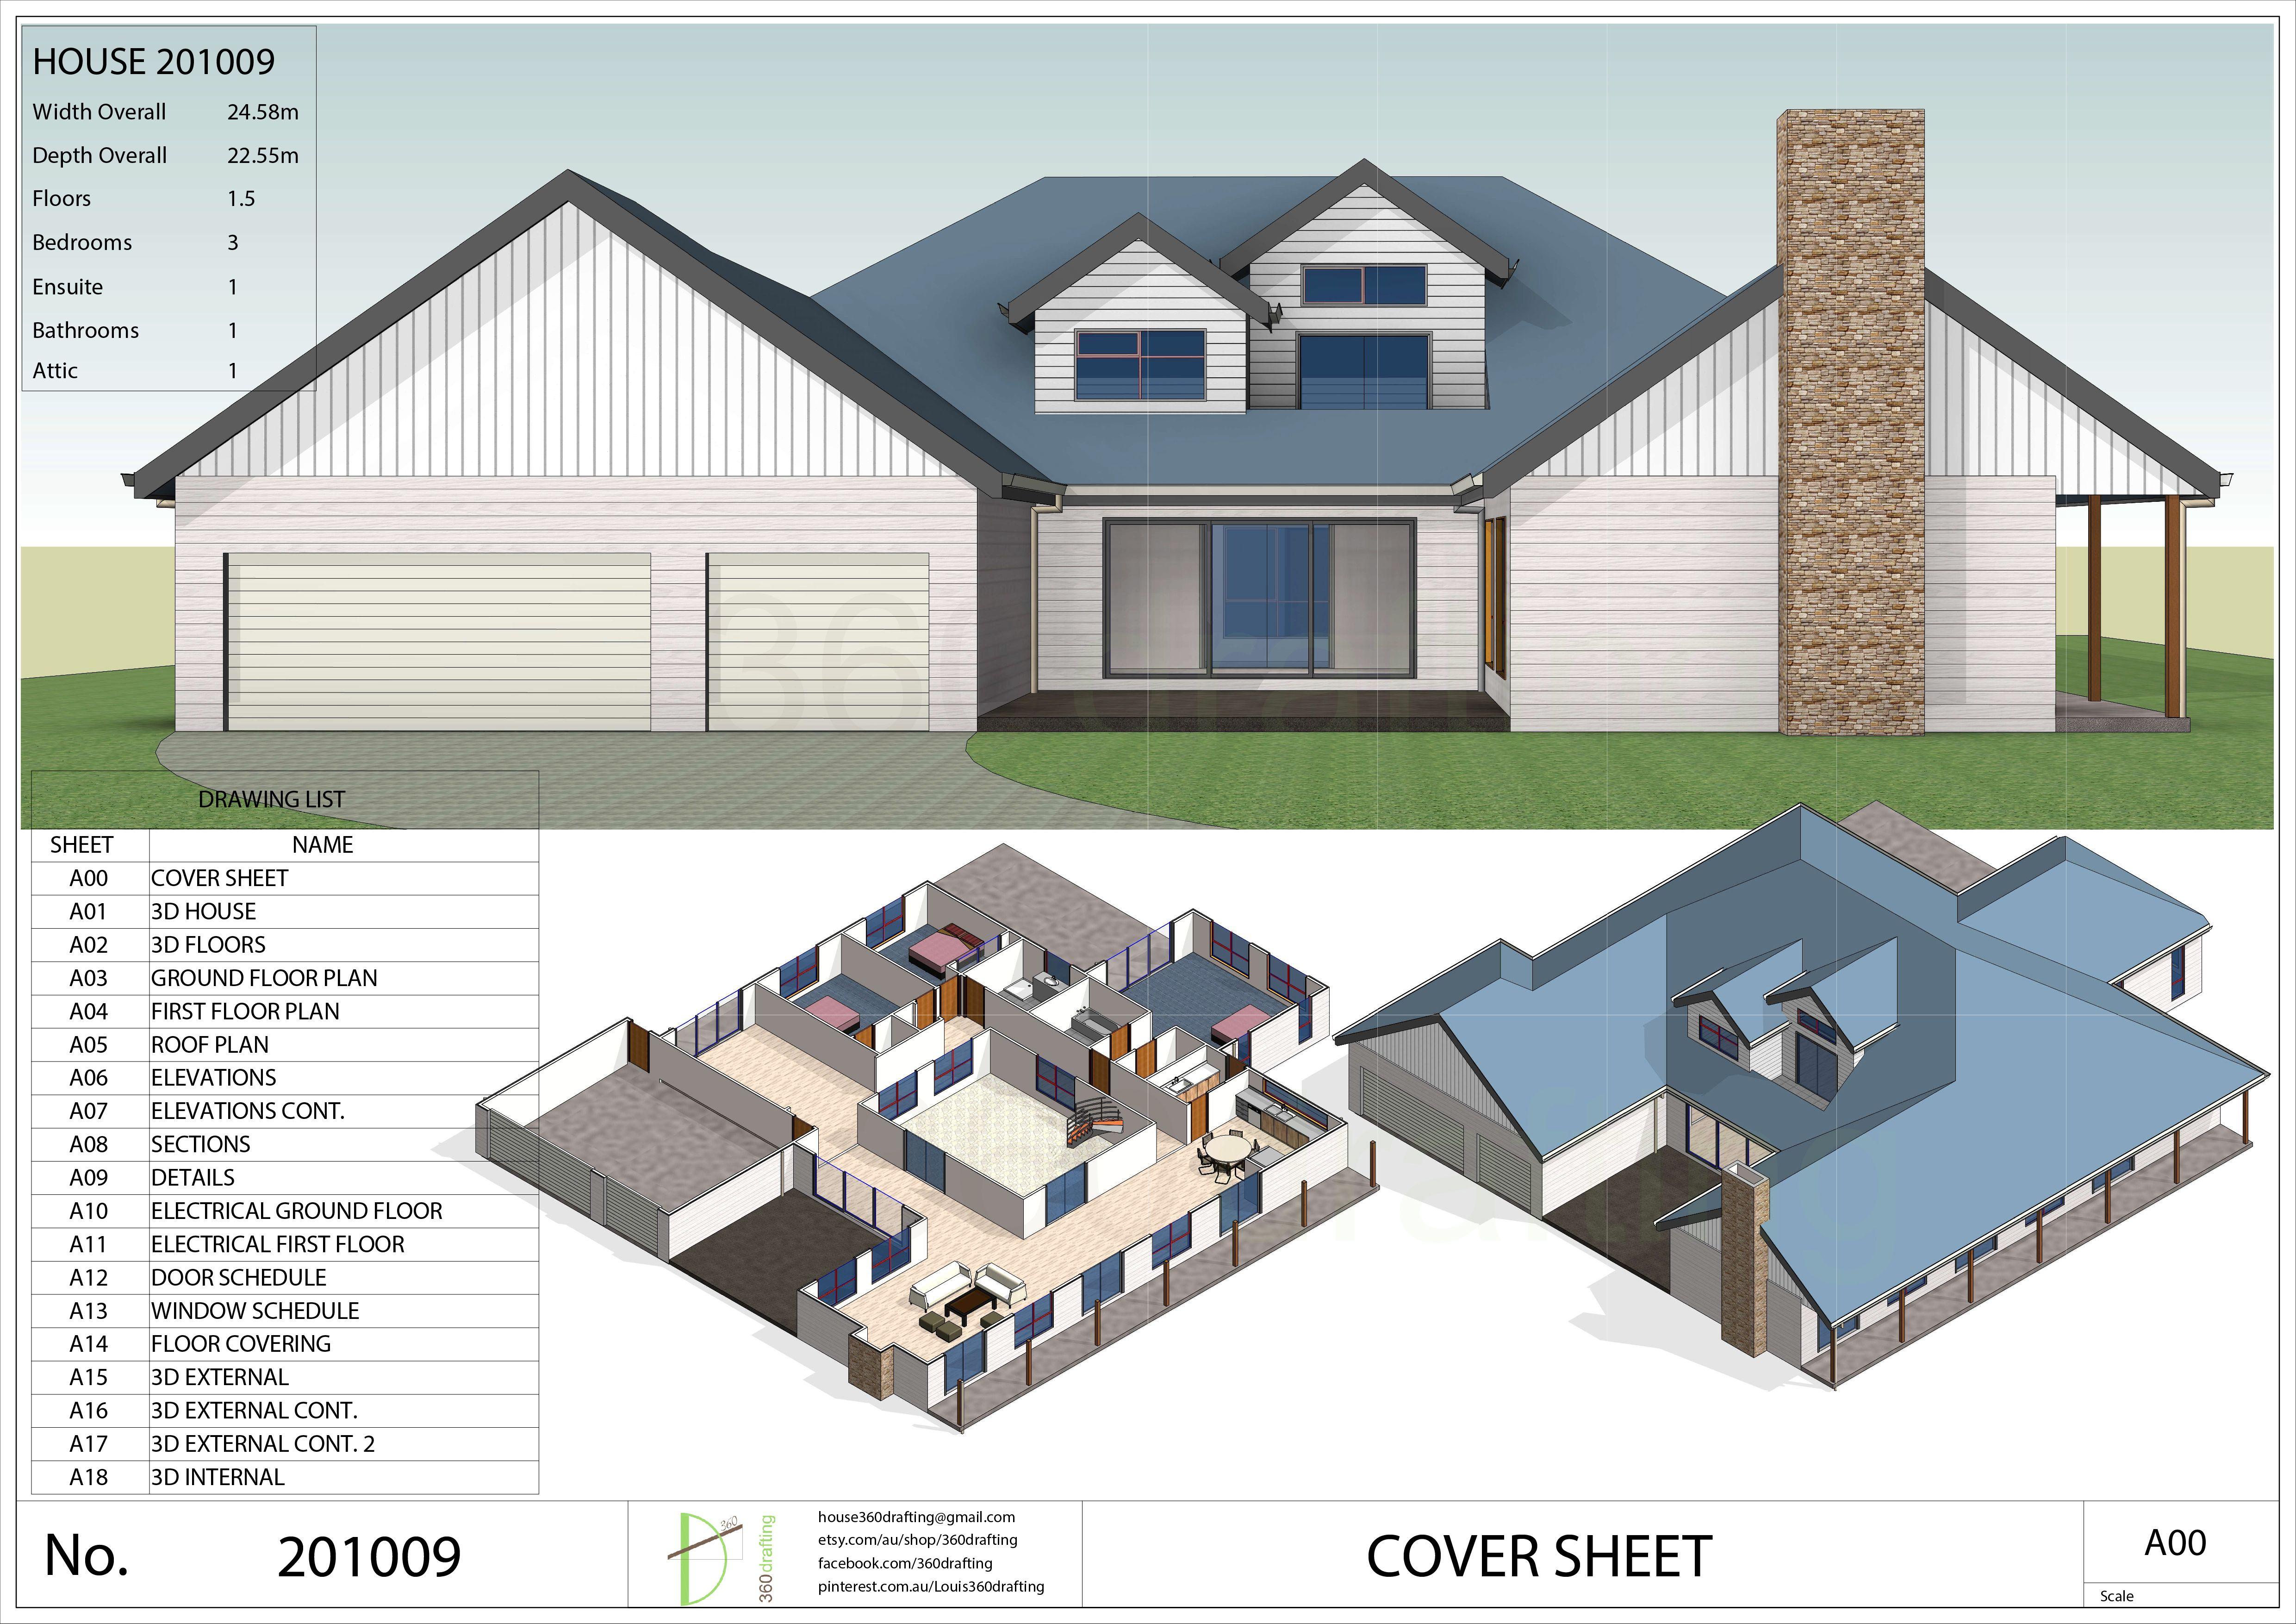 HOUSE PLAN 3 bedrooms bathrooms pdf floor plan instant CUSTOM plans service